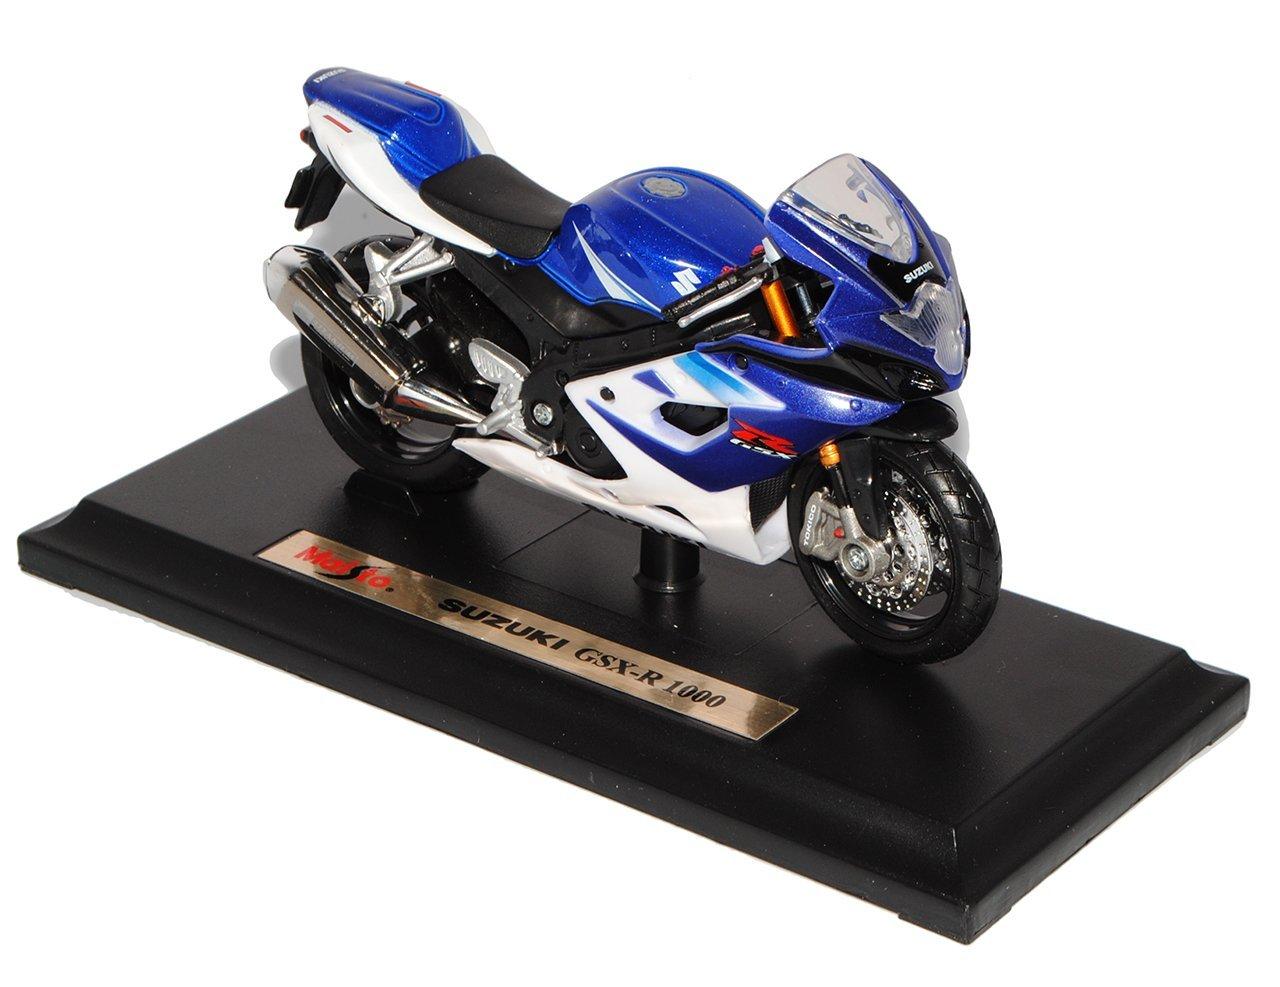 Suzuki Gsx R 1000 R1000 Blau 1 18 Maisto Modellmotorrad Modell Motorrad Amazoncouk Toys Games